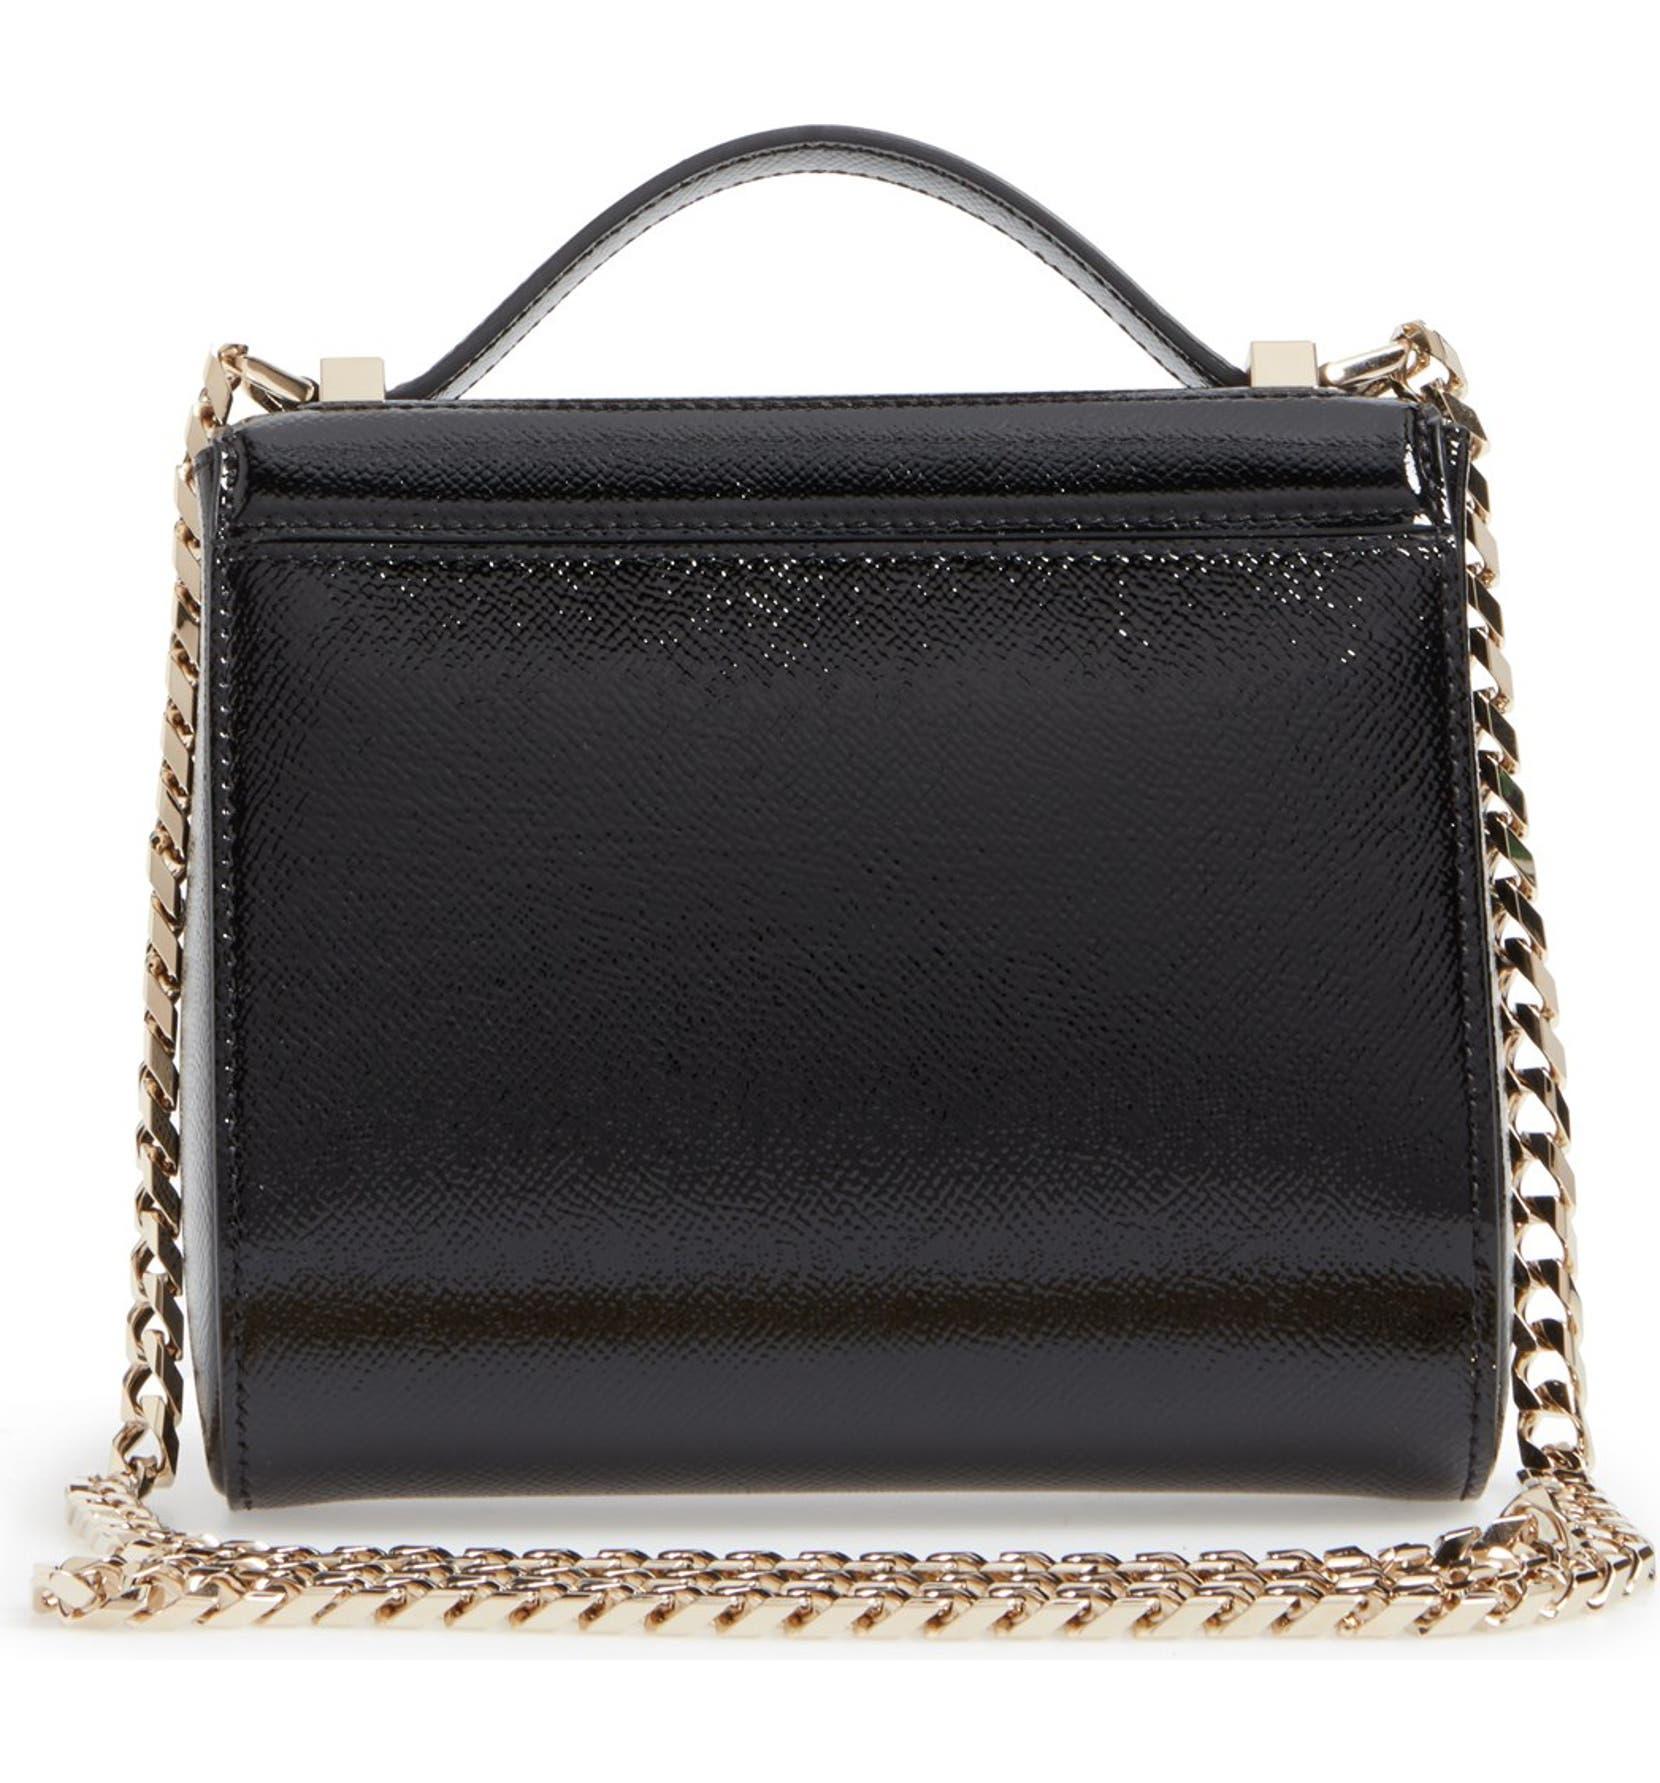 Givenchy  Mini Pandora Box  Leather Shoulder Bag  a2755b5d7bed9